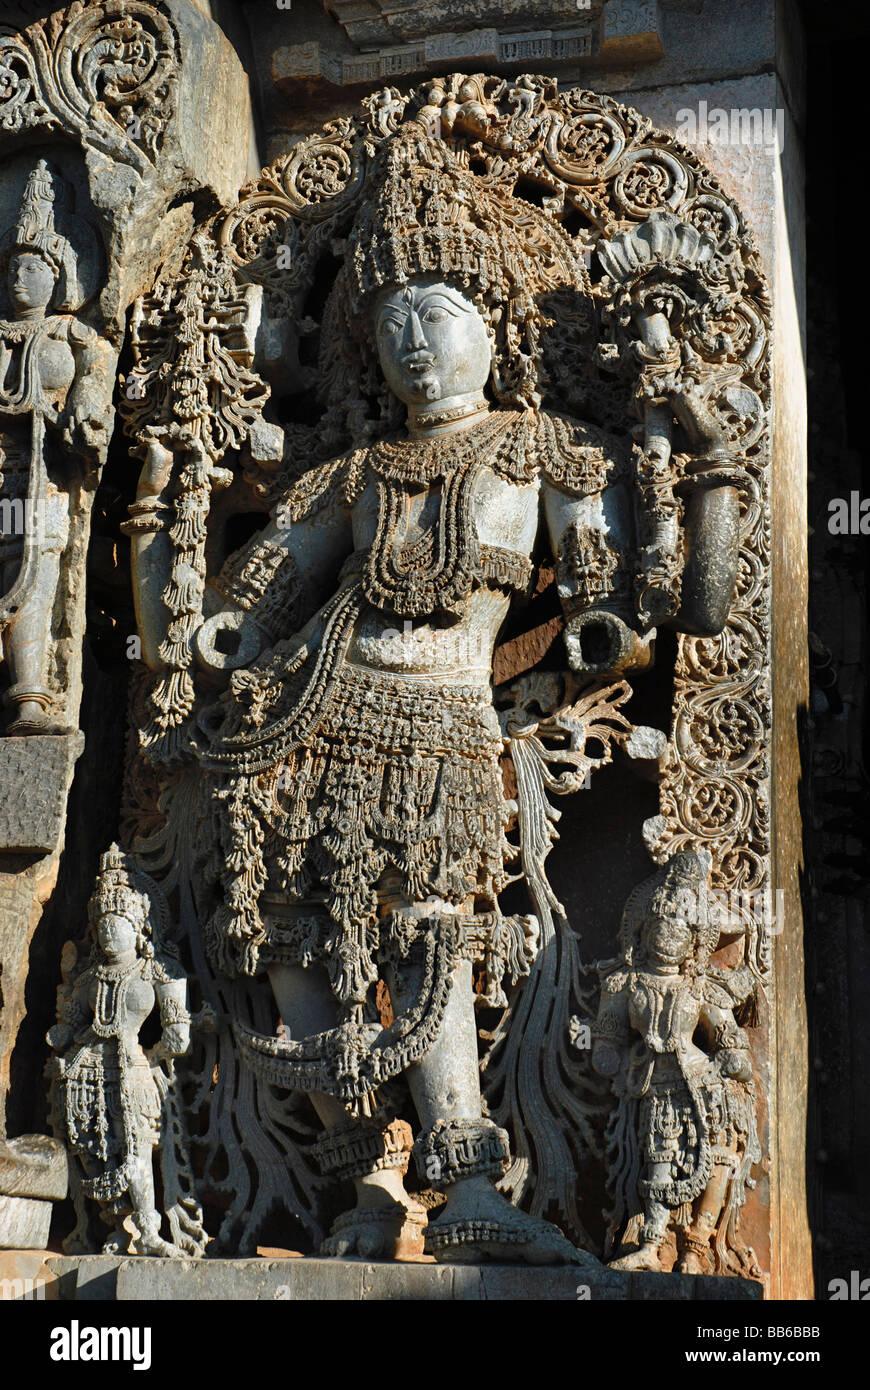 Halibid - Karnataka - Highly ornamented Vishnu on the Western wall of the temple. - Stock Image